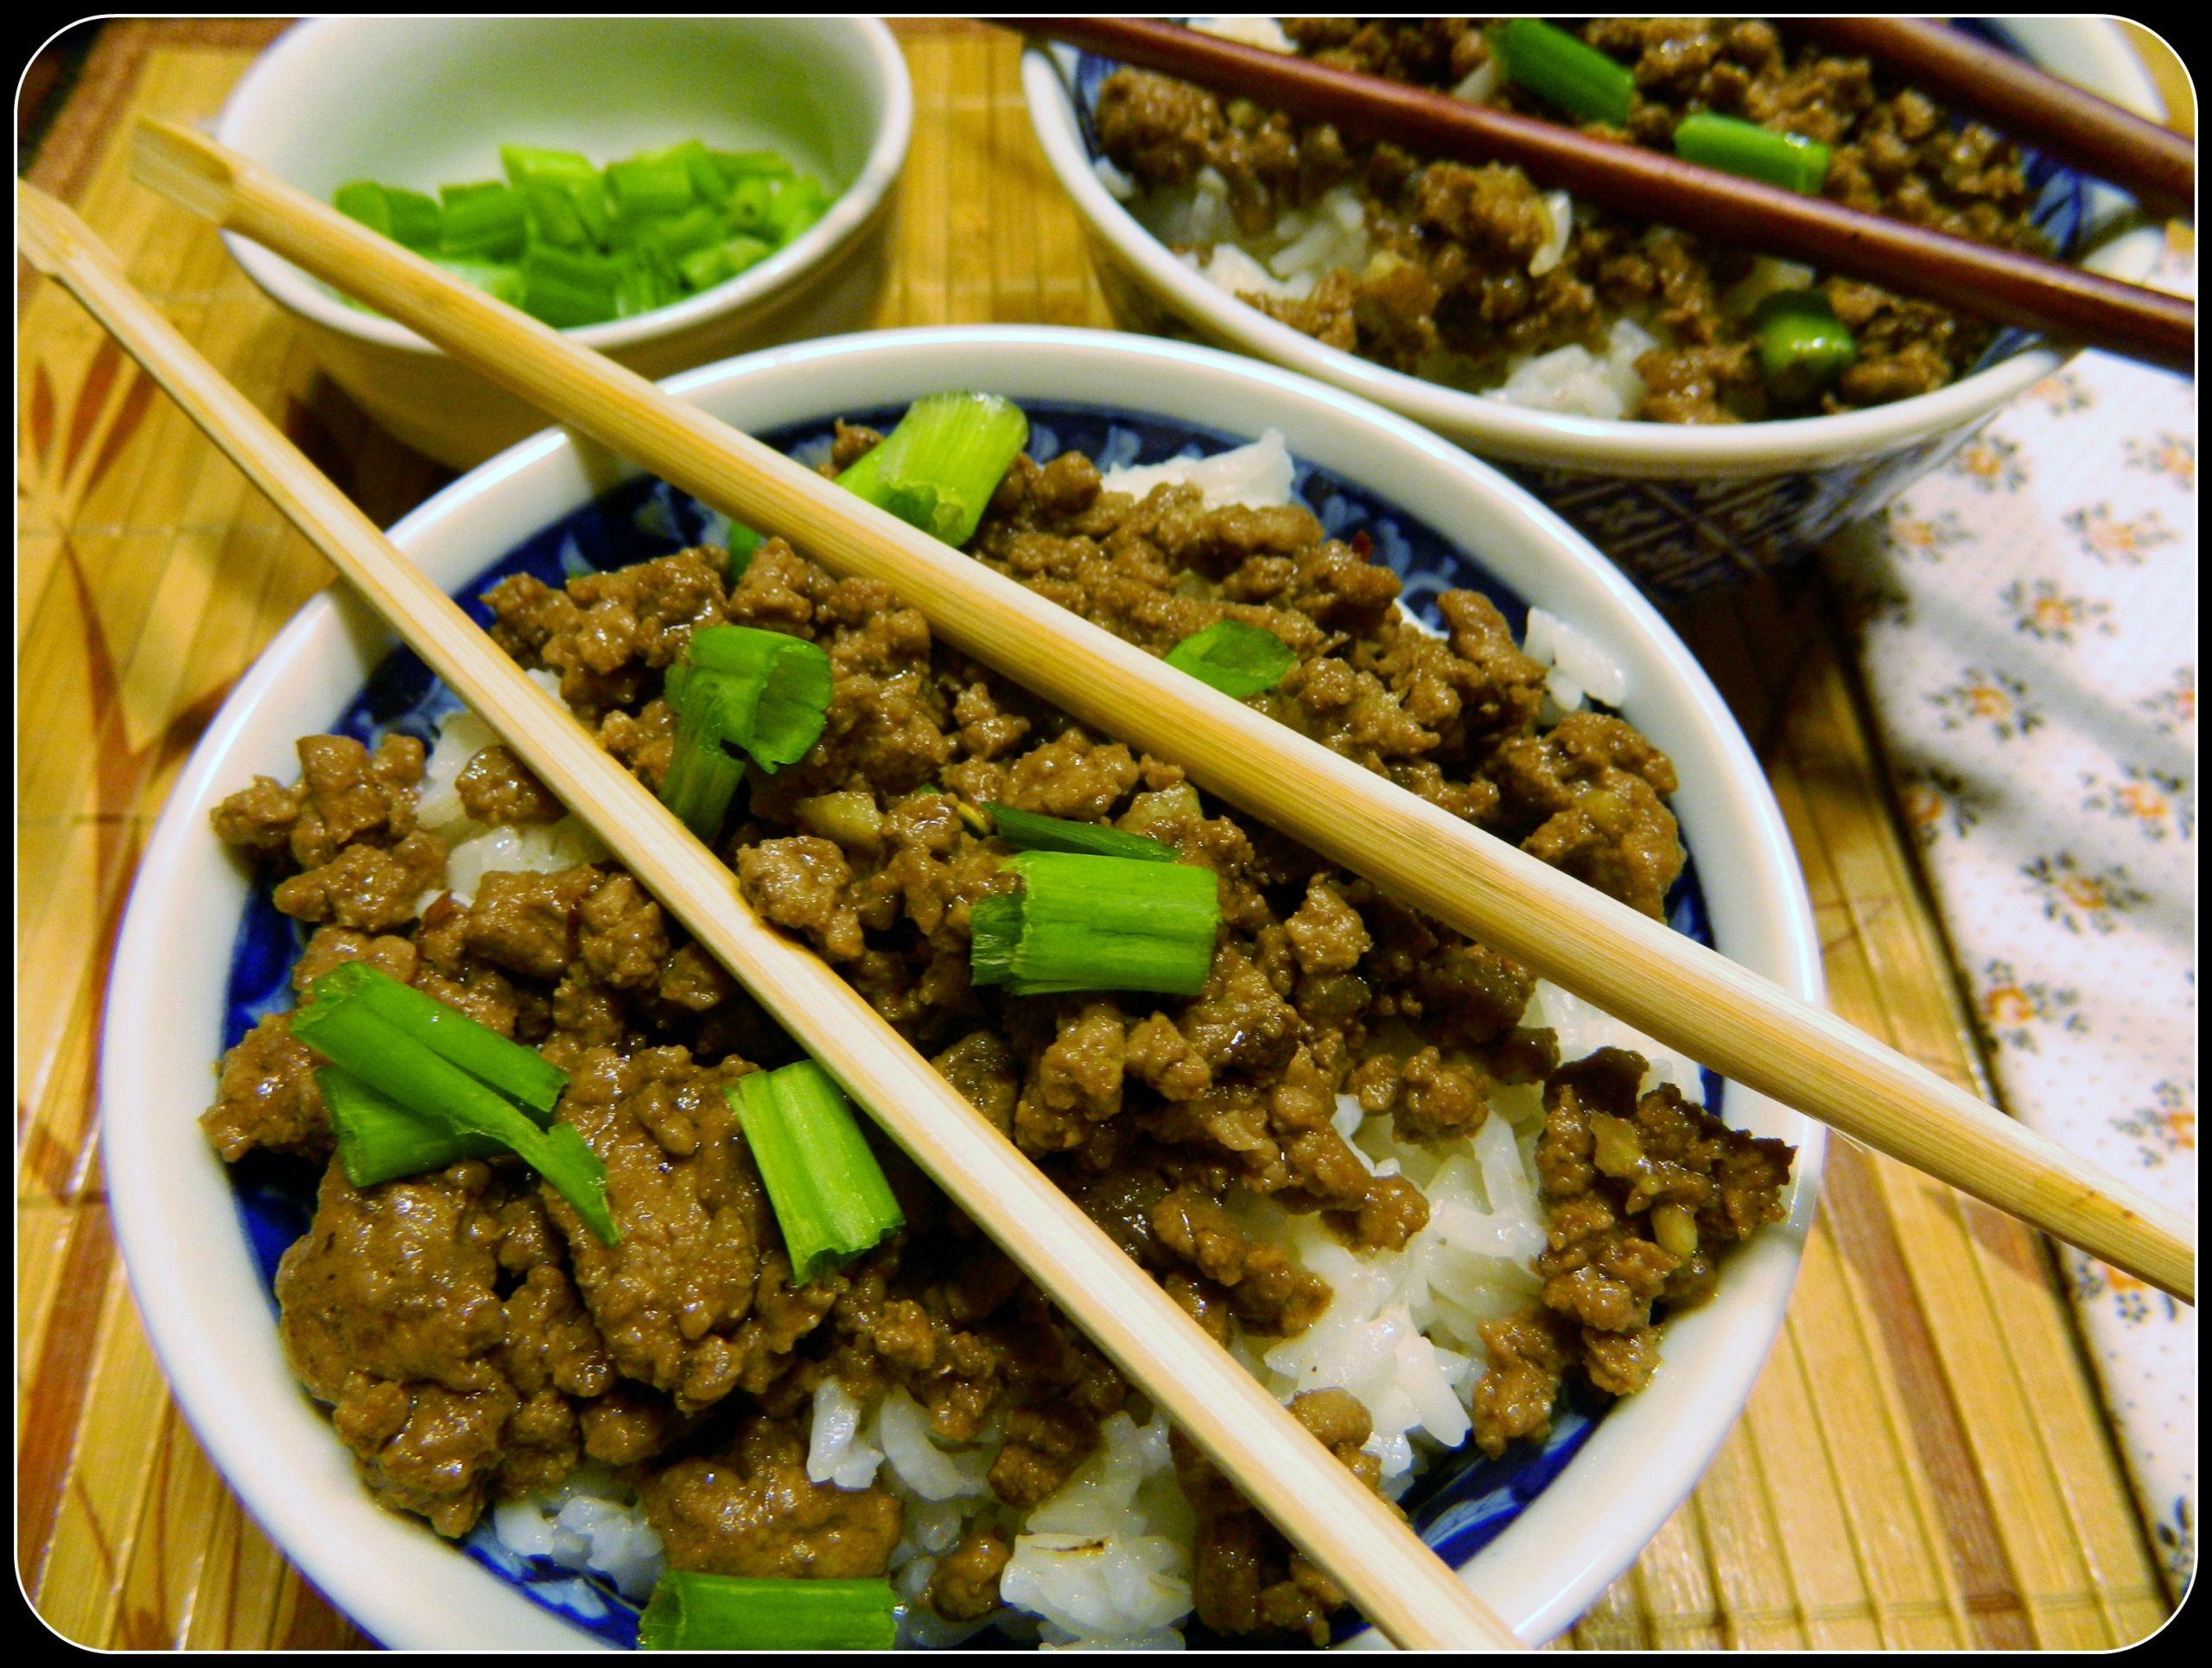 Ground Beef Stir Fry Recipes  Ground Beef Stir Fry Over Rice